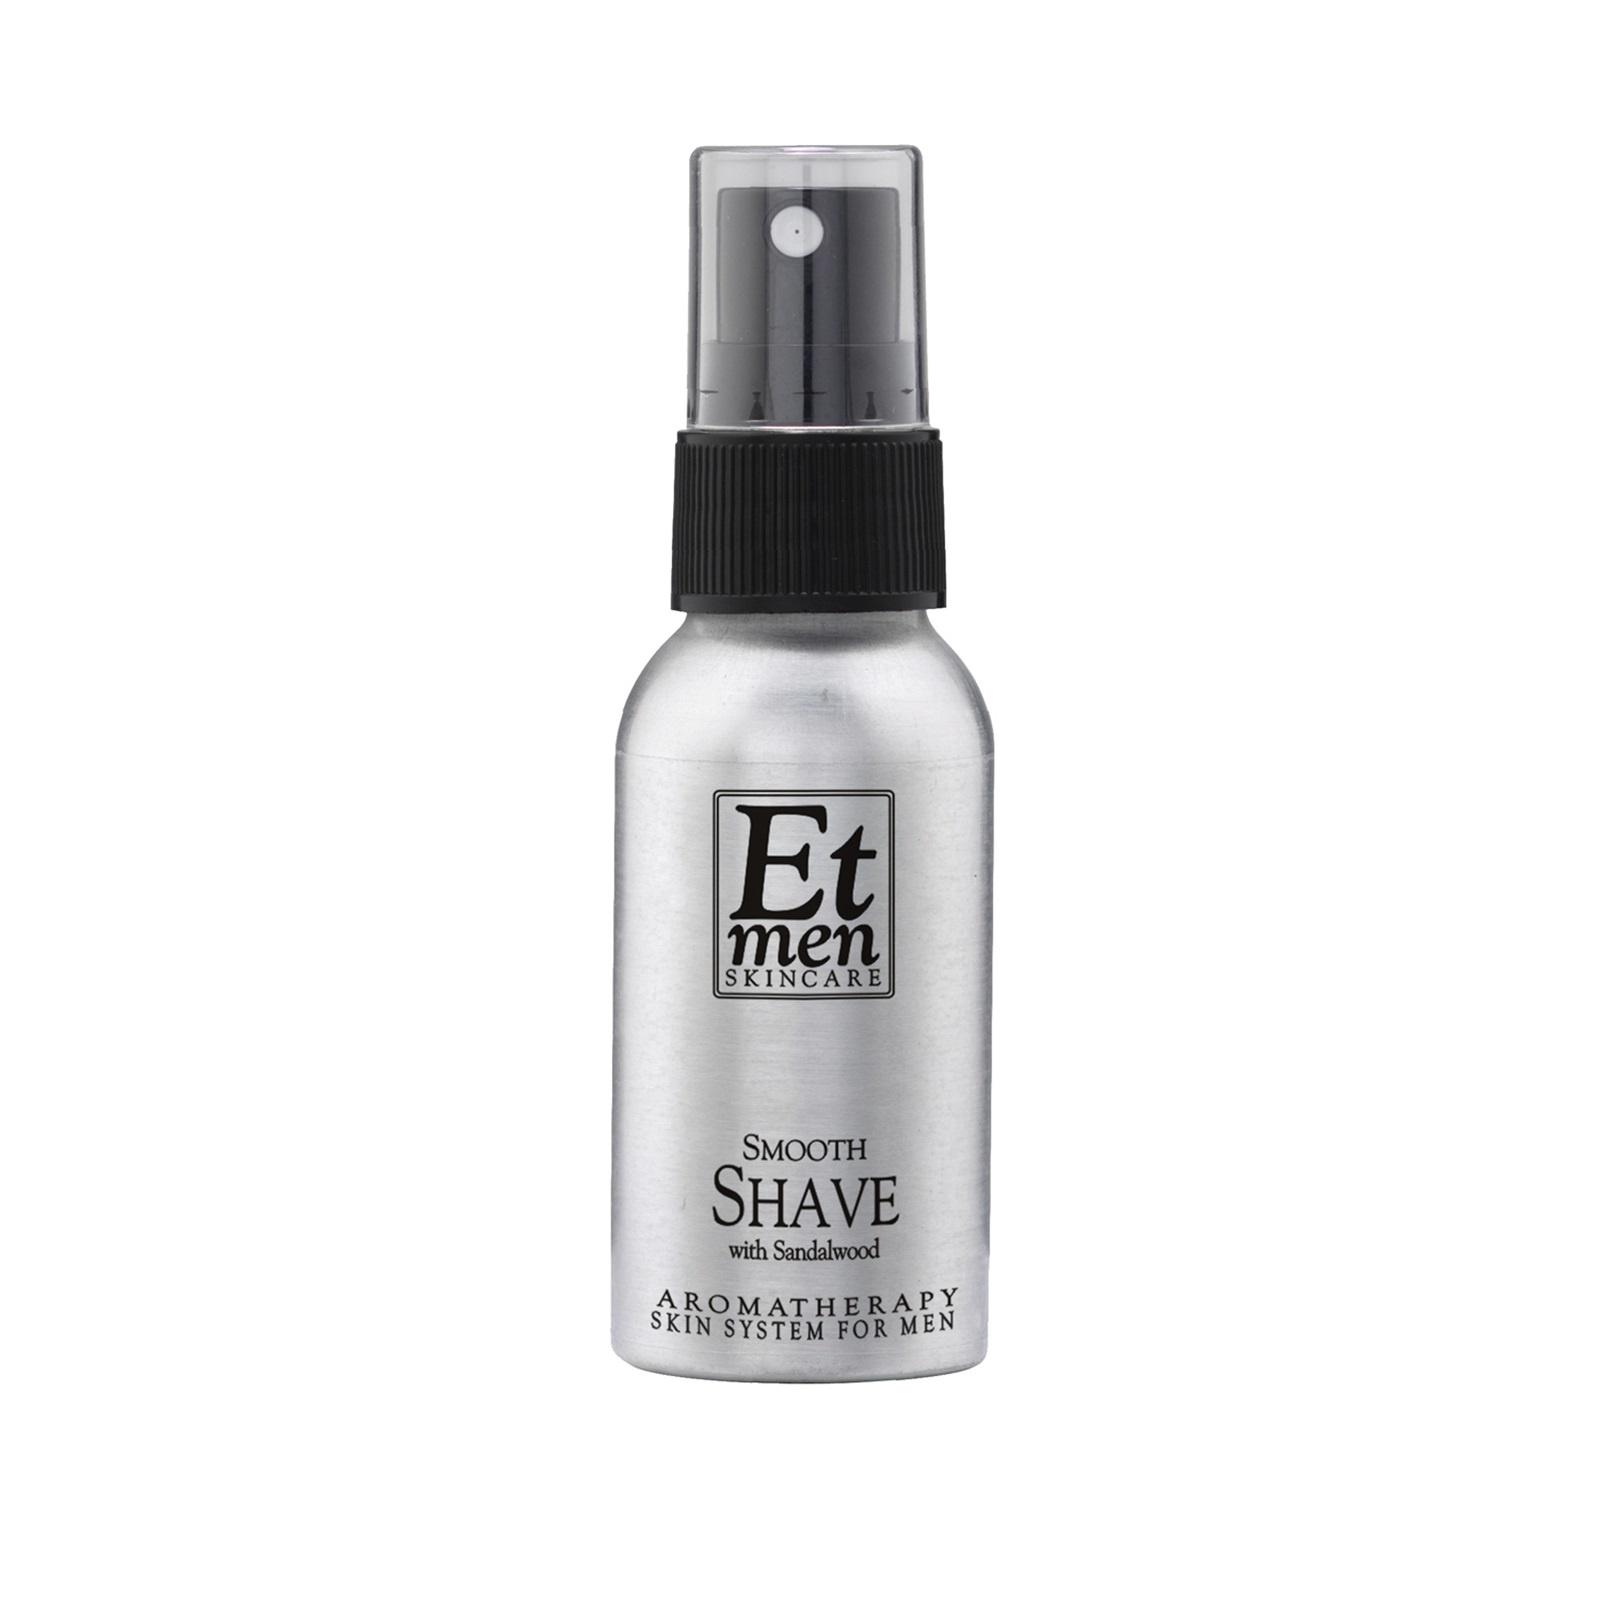 Eve Taylor Mens Shave Oil 50ML - Eve Taylor